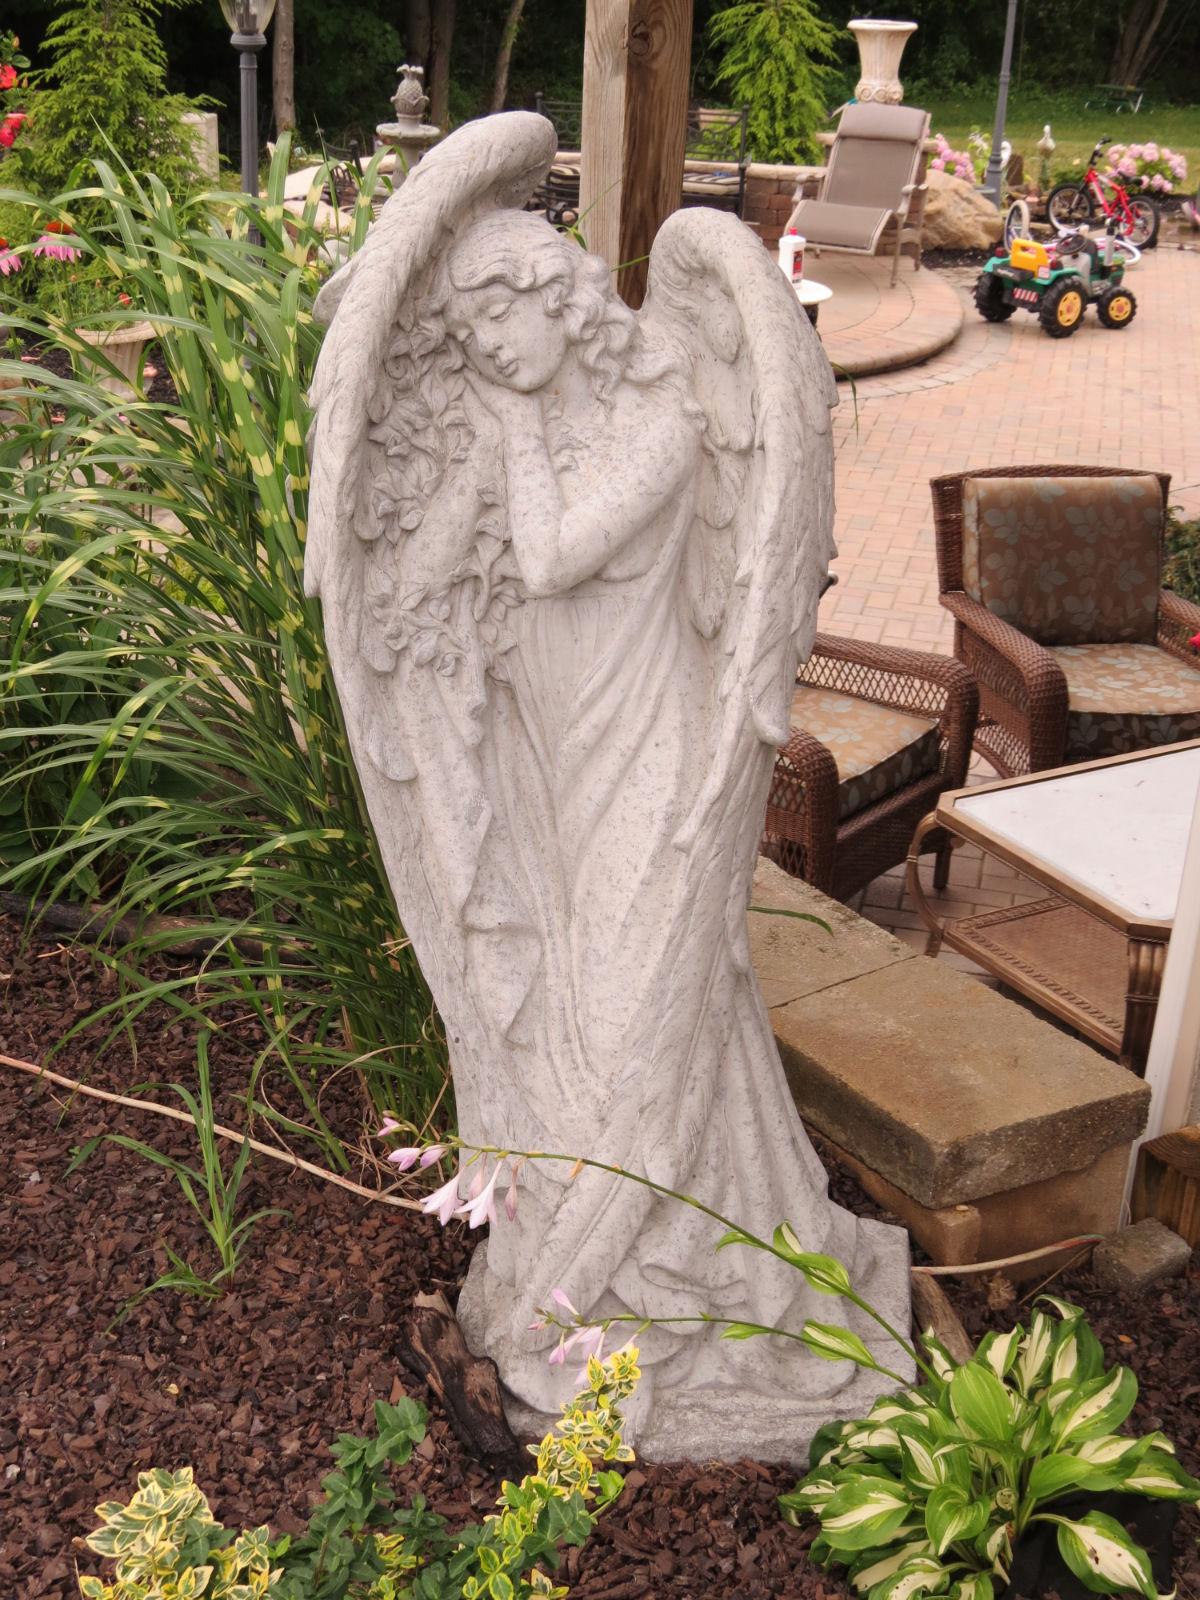 Concrete Angel Statue  Casey and Gram